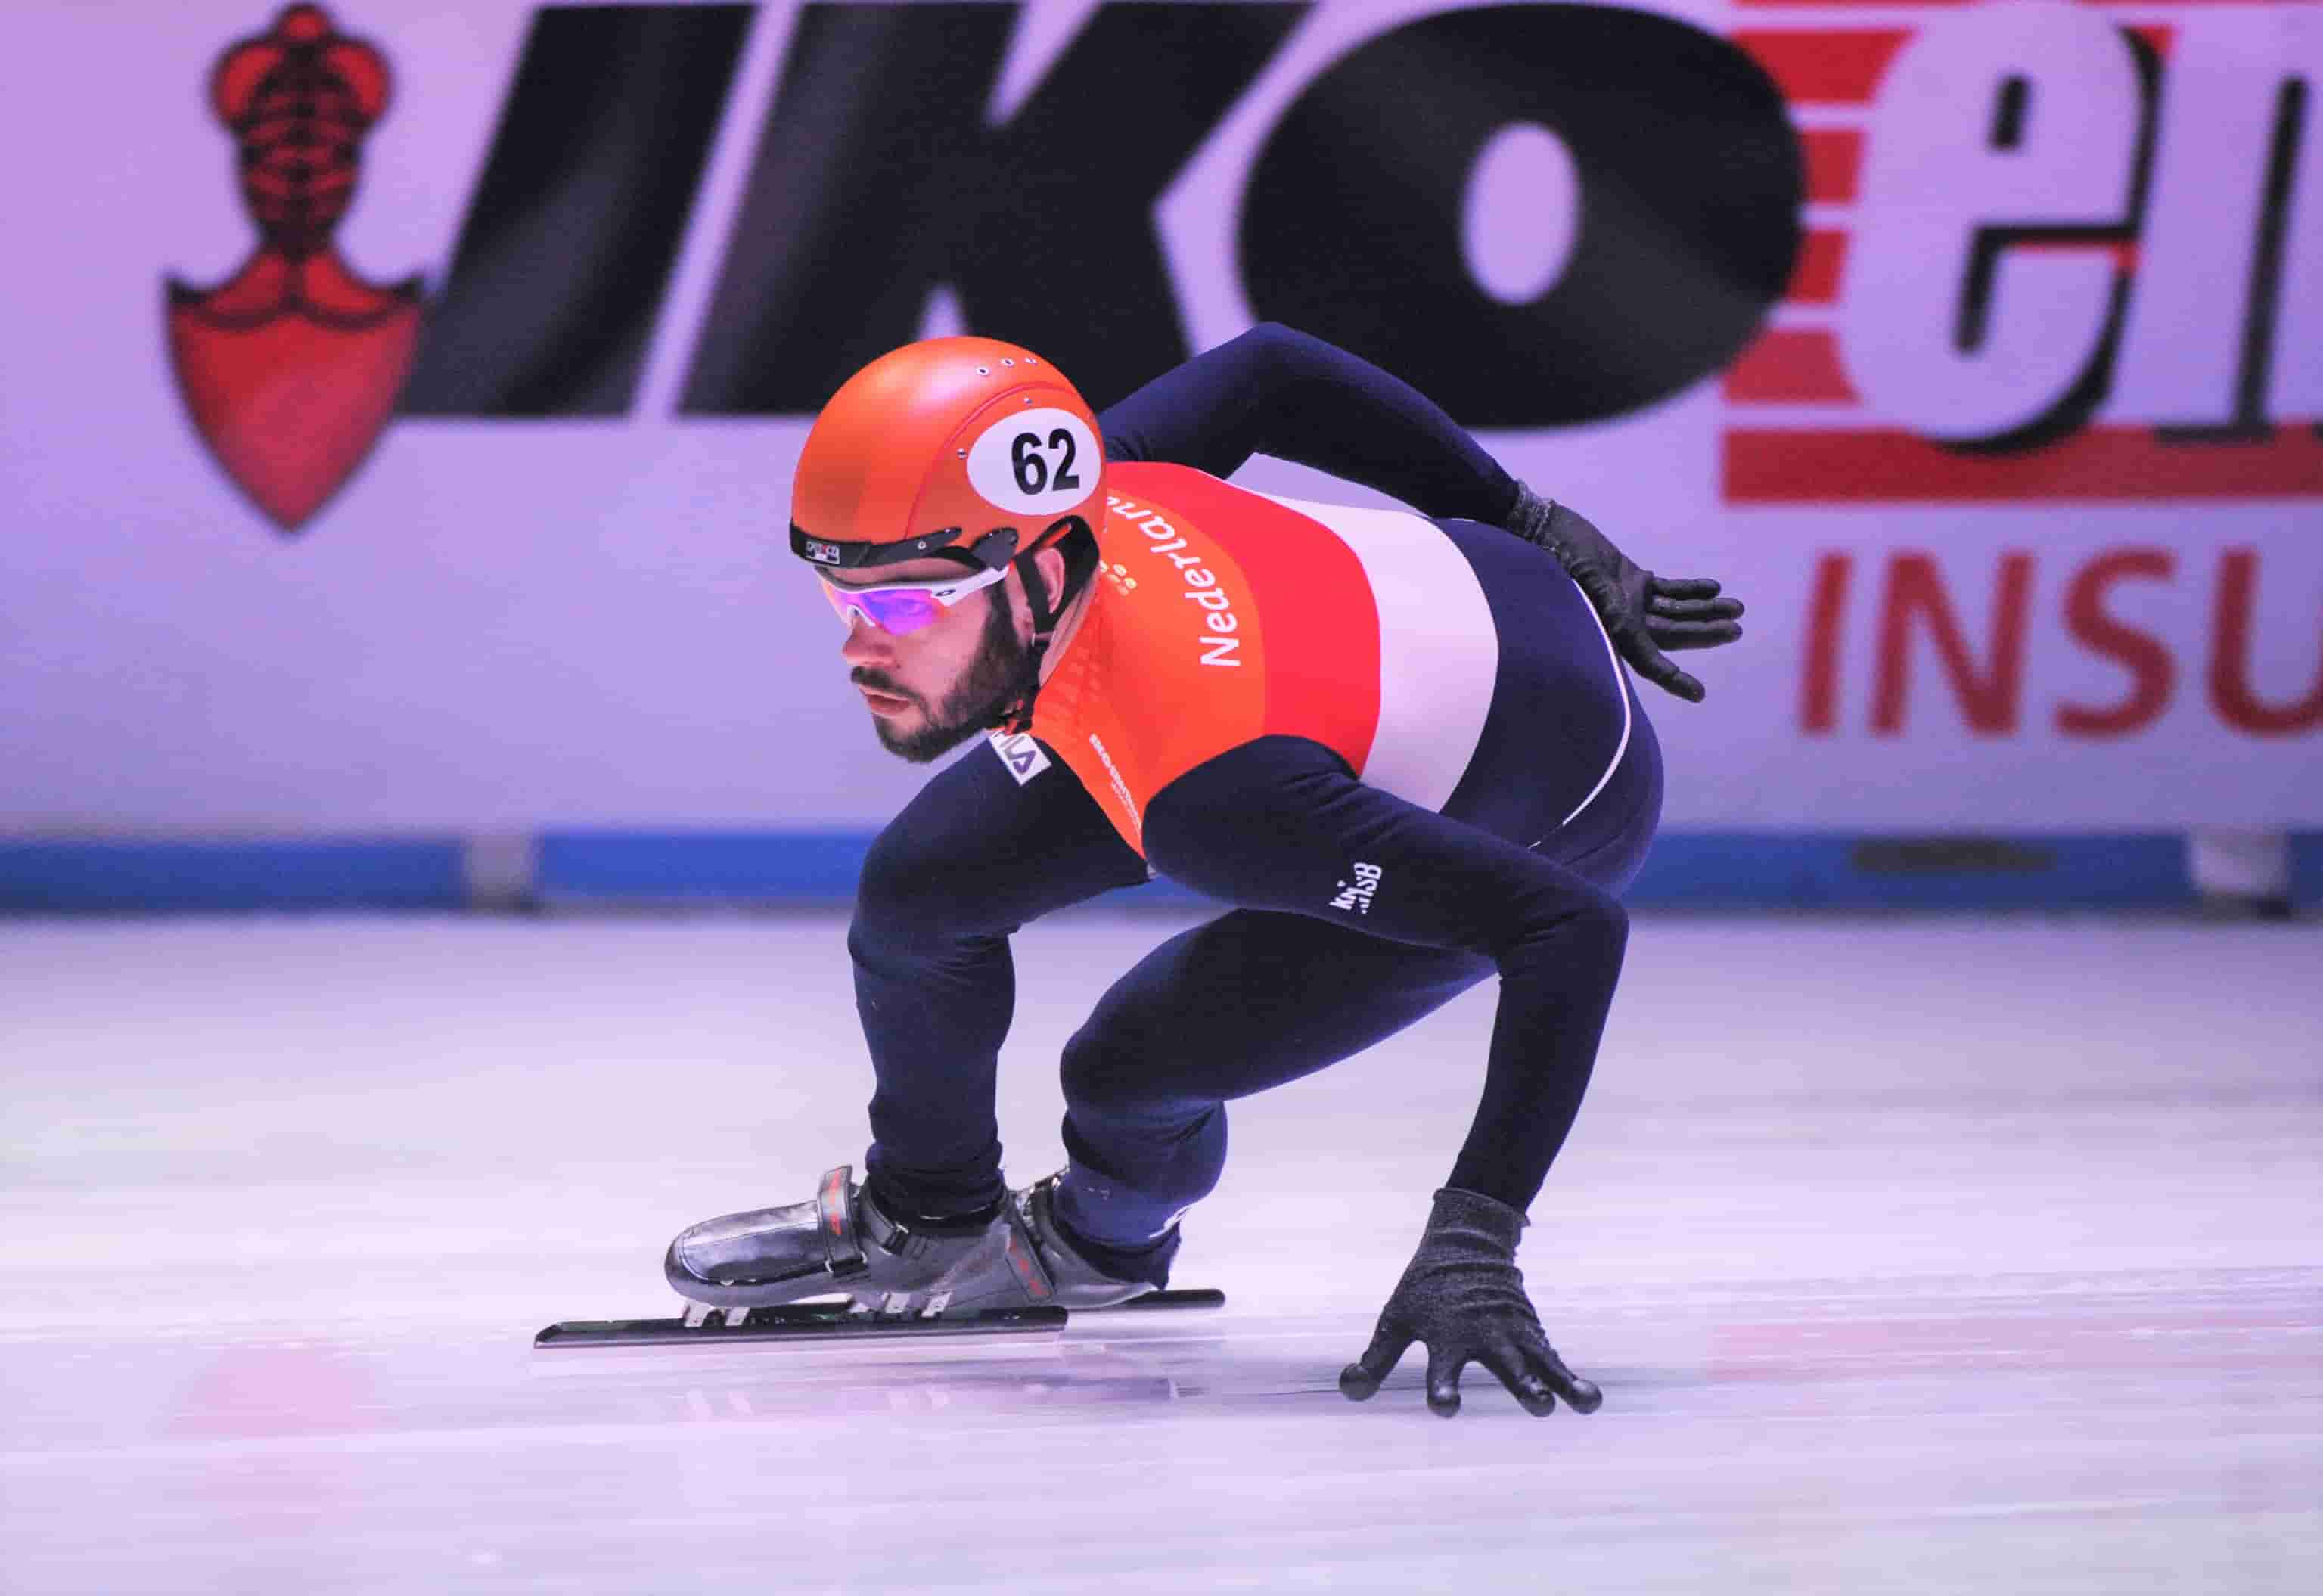 IKO insulations sponsort Sjinkie en WK shorttrack Ahoy